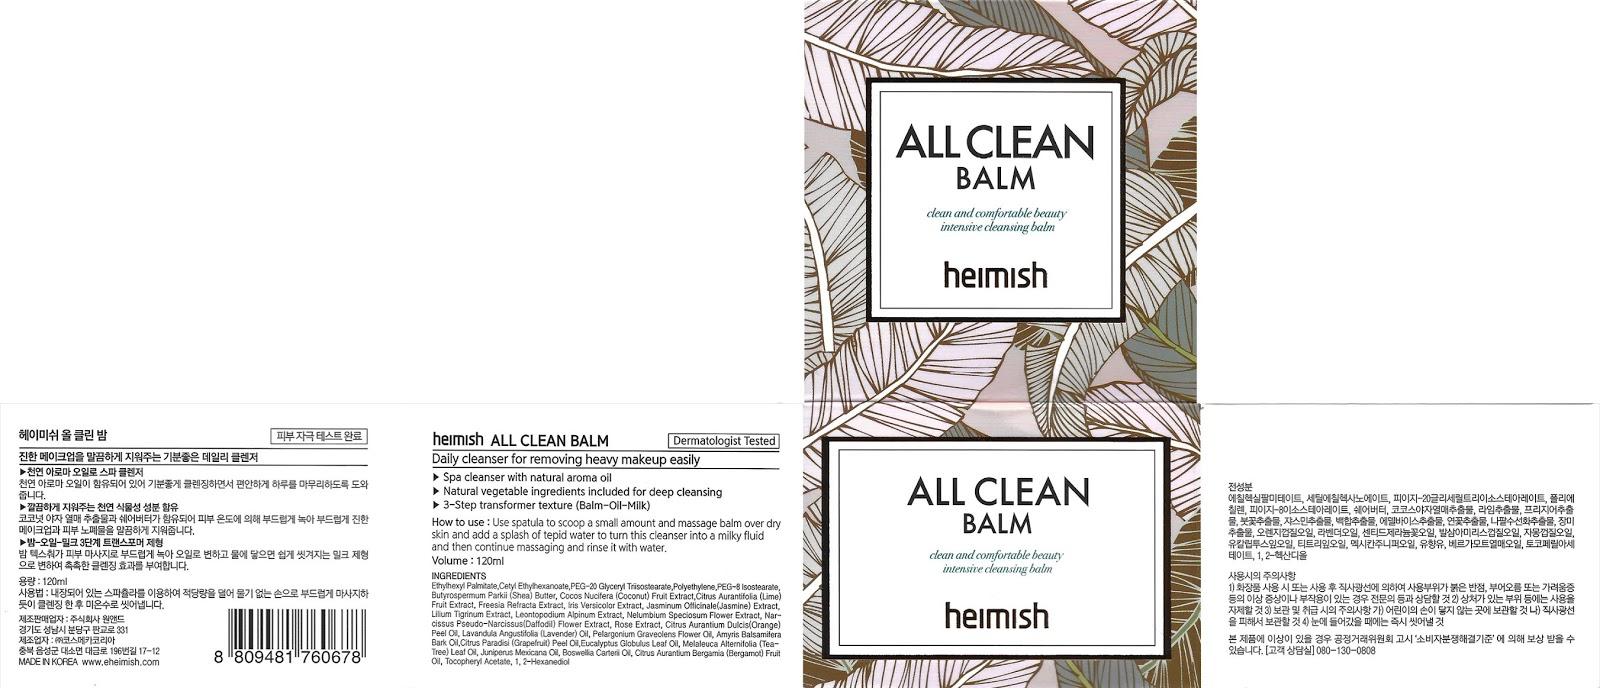 lavlilacs heimish All Clean Balm packaging